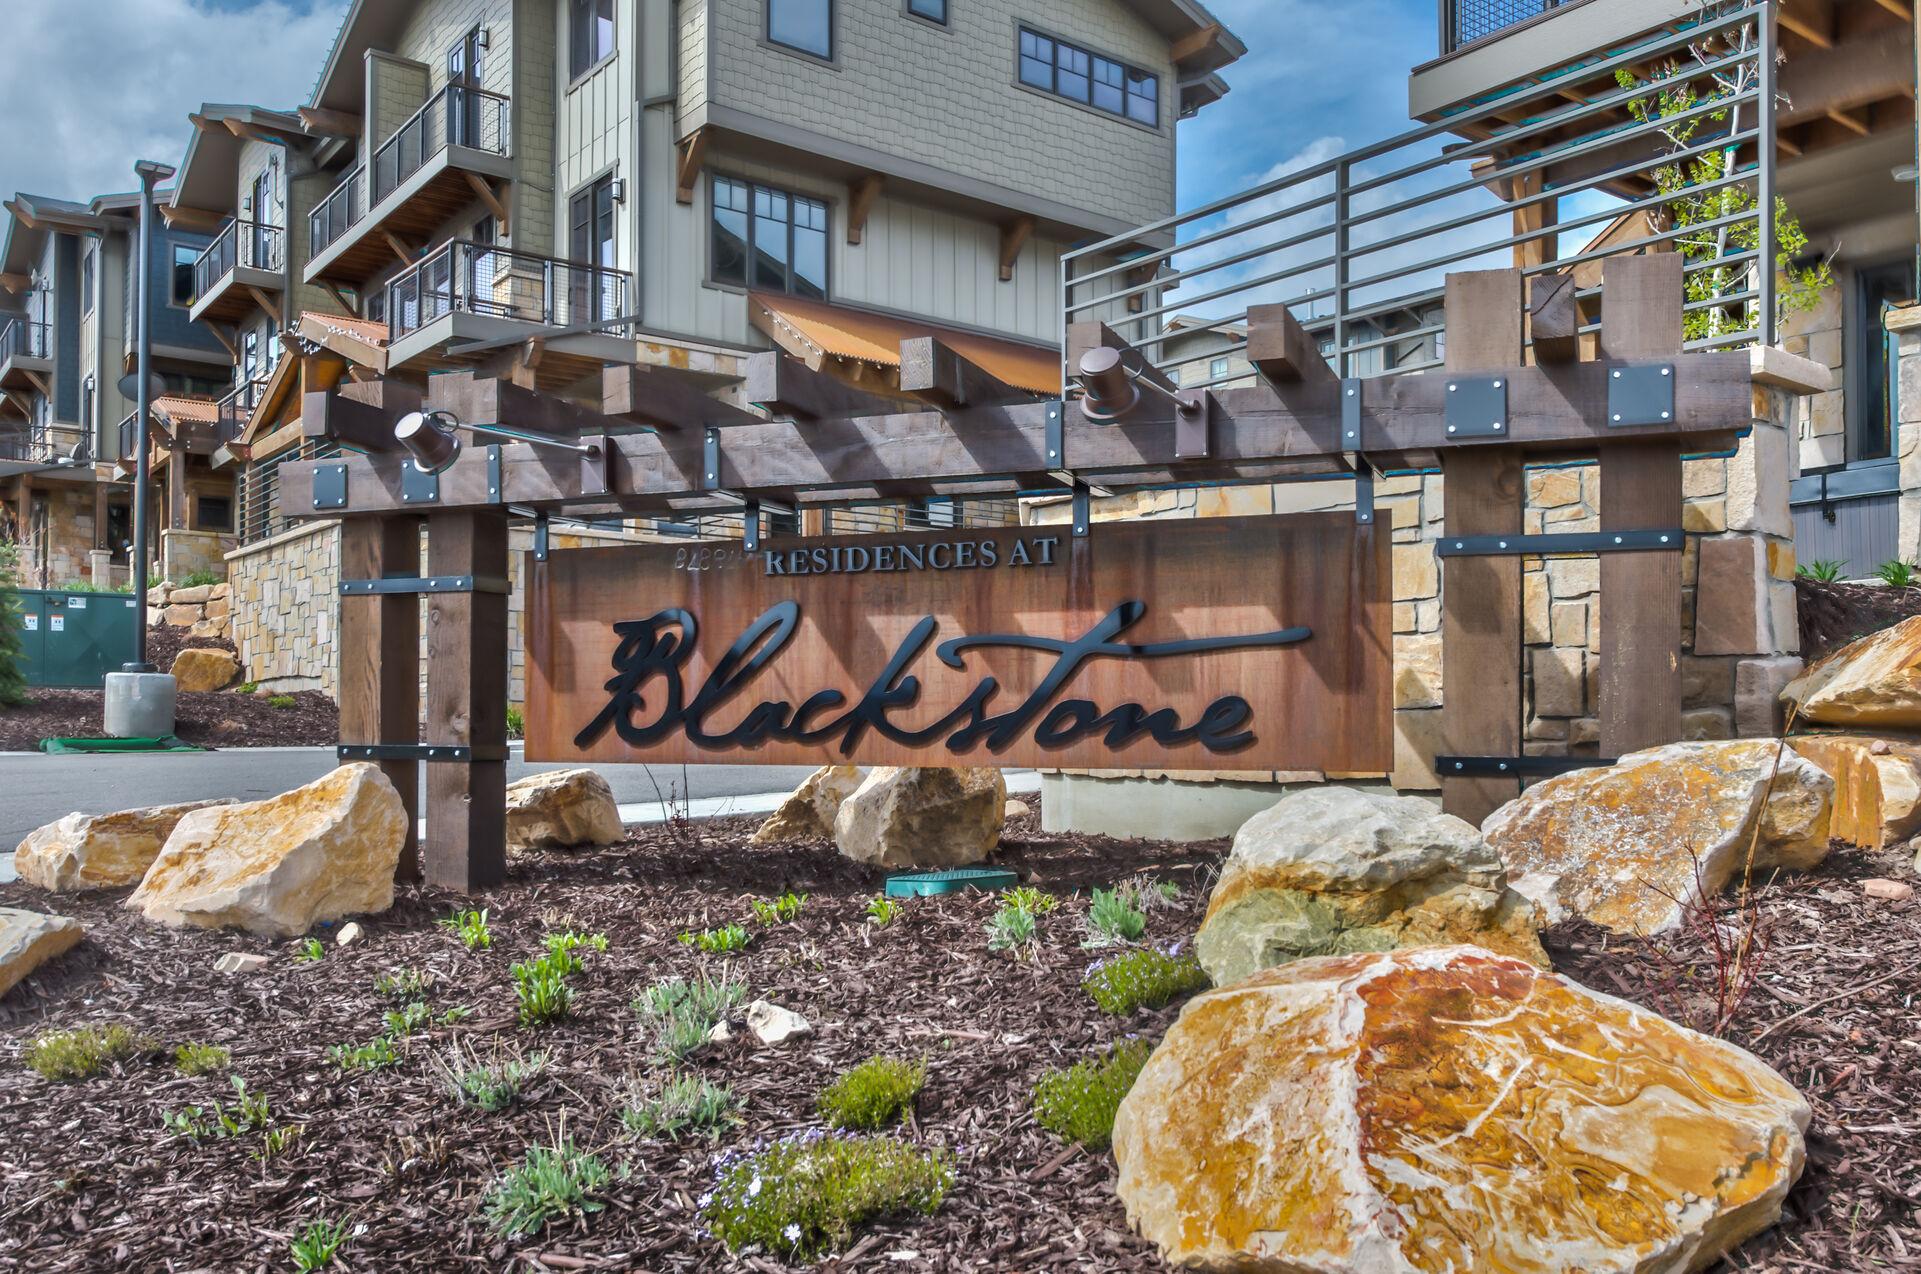 Entry to the Blackstone Community